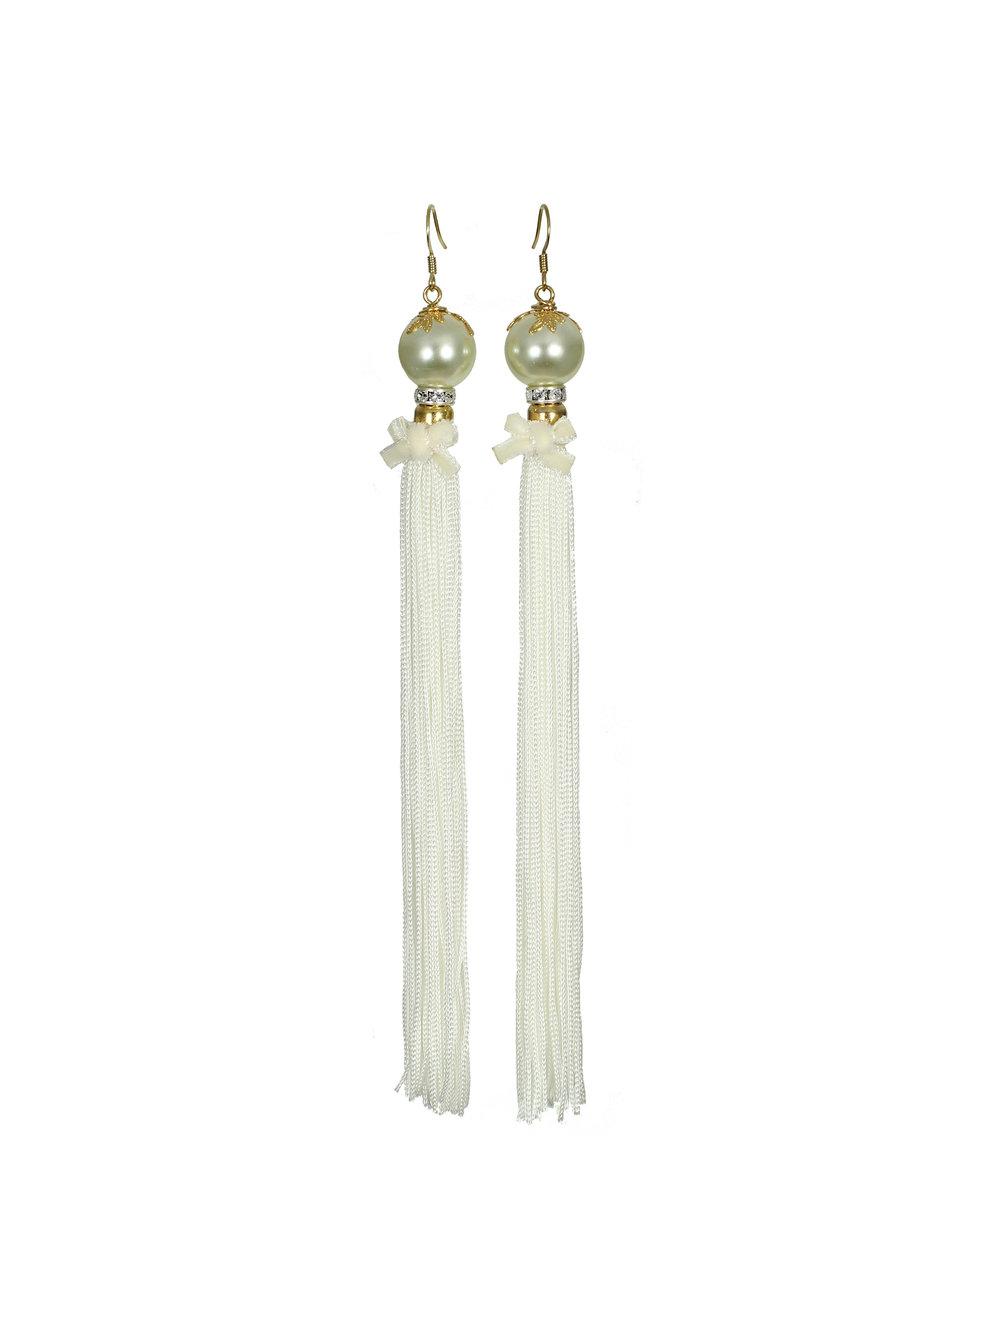 067W - Pearl & Tassel Earrings - White.jpg